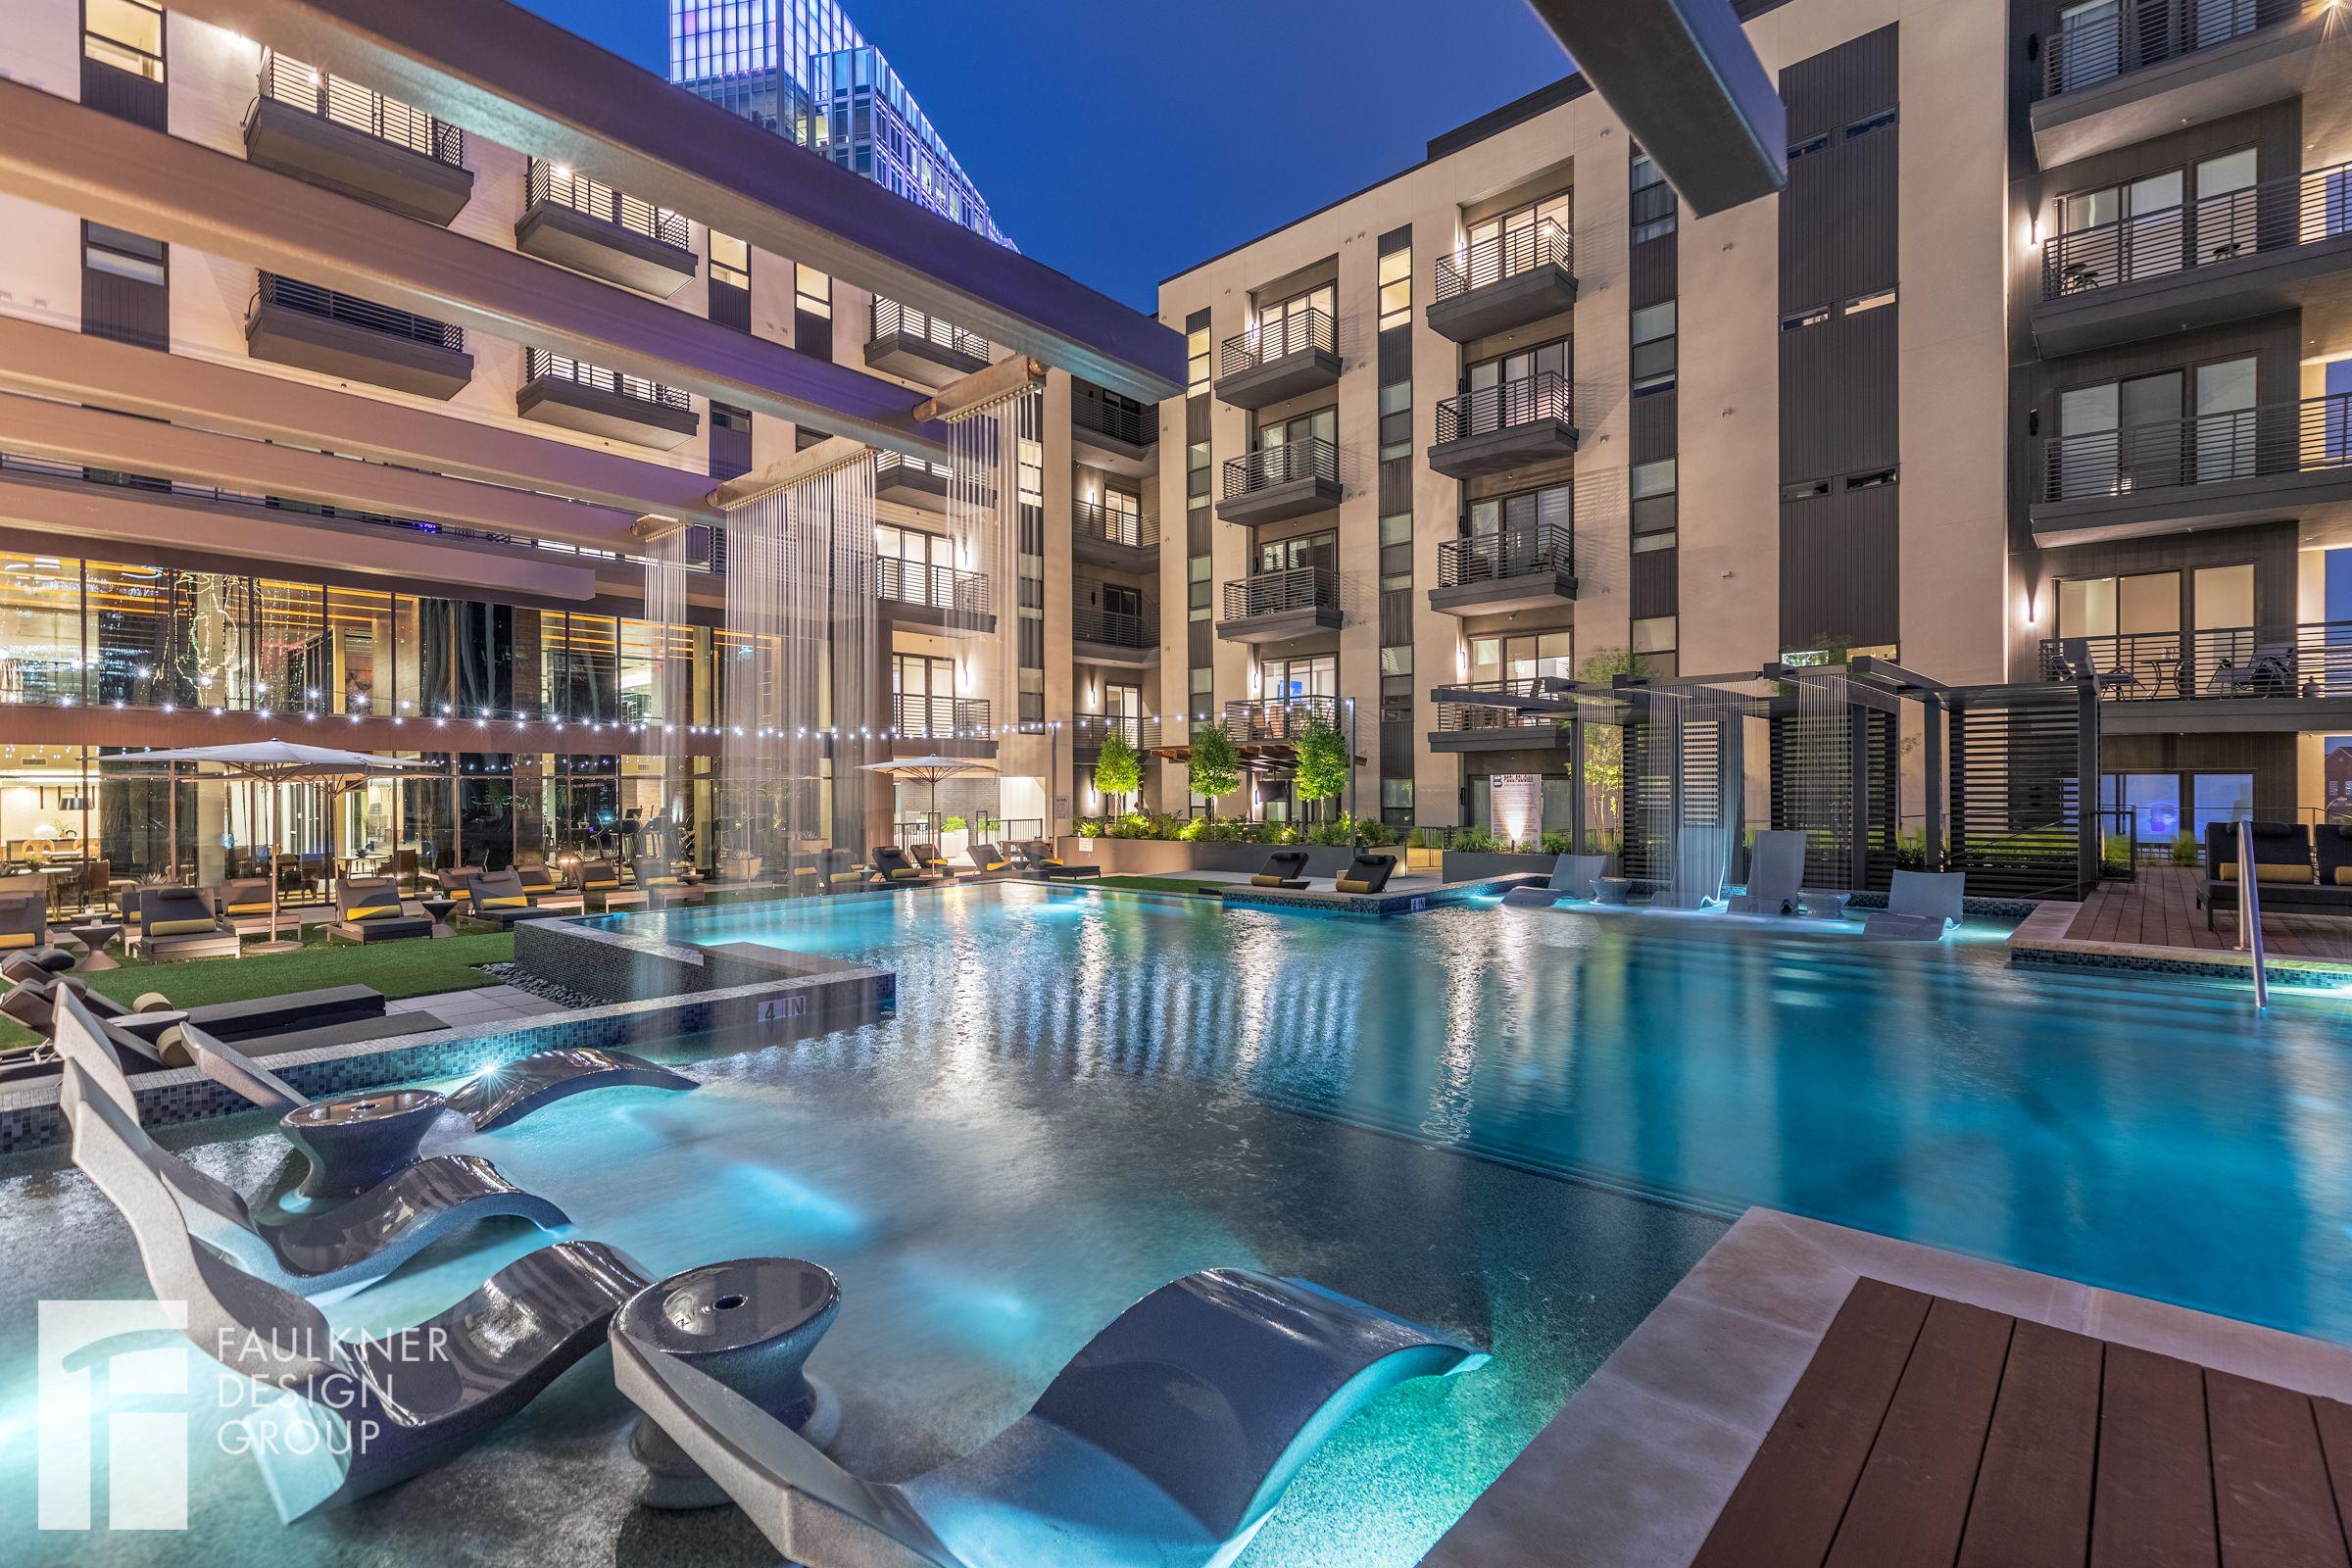 Designed By Faulkner Design Group Infinitypool Resortstylepool Luxurydeck Outdoorlounge Lounger Luxury Apartments Resort Style Pool Rental Apartments